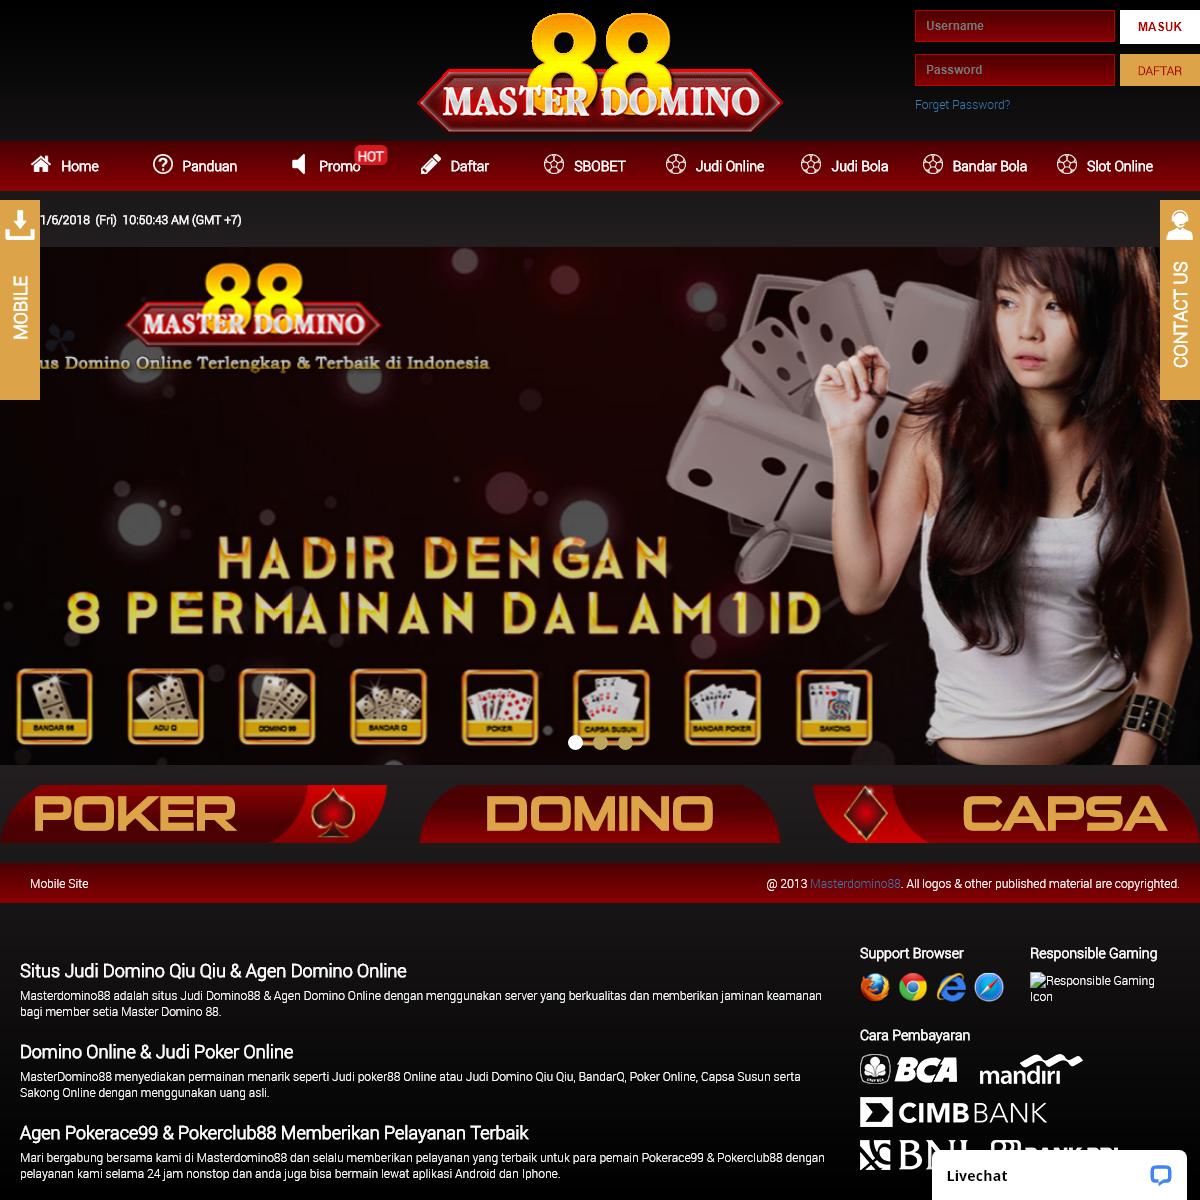 Masterdomino88 Situs Judi Poker Domino Online Terpercaya